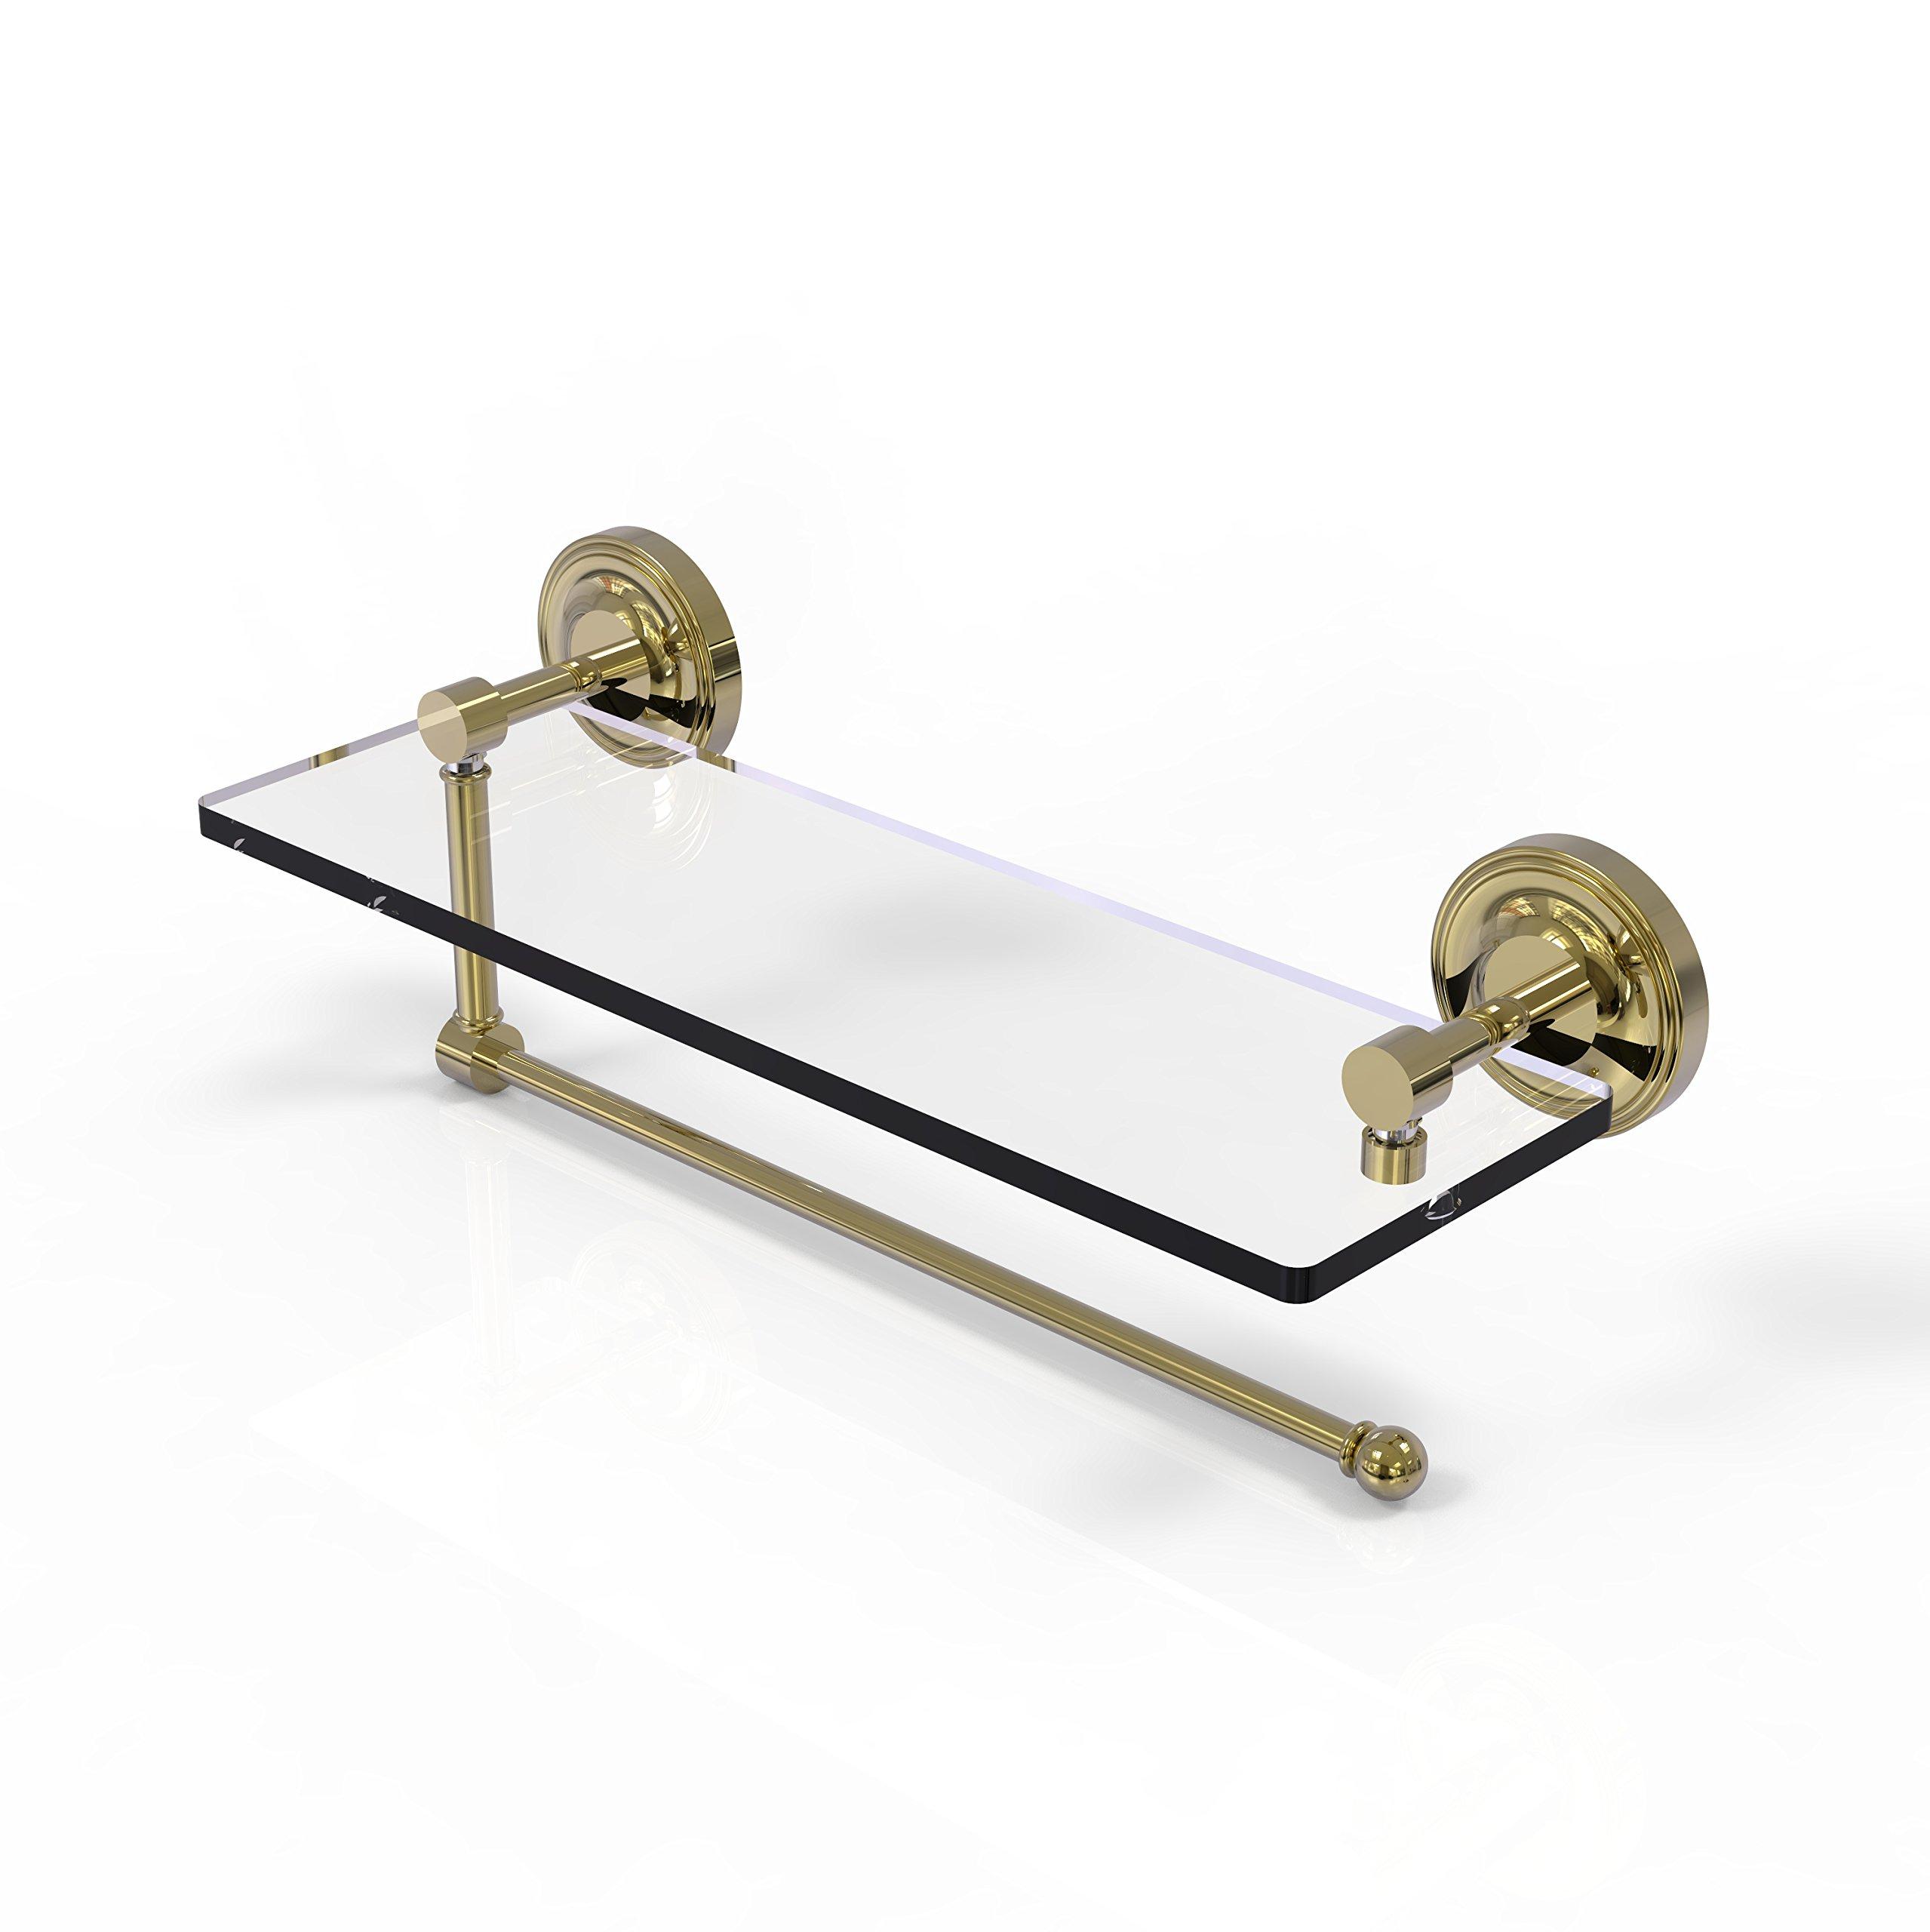 Allied Brass Prestige Regal Collection Paper Towel Holder with 16 Inch Glass Shelf PRBP-1PT/16 - Unlacquered Brass